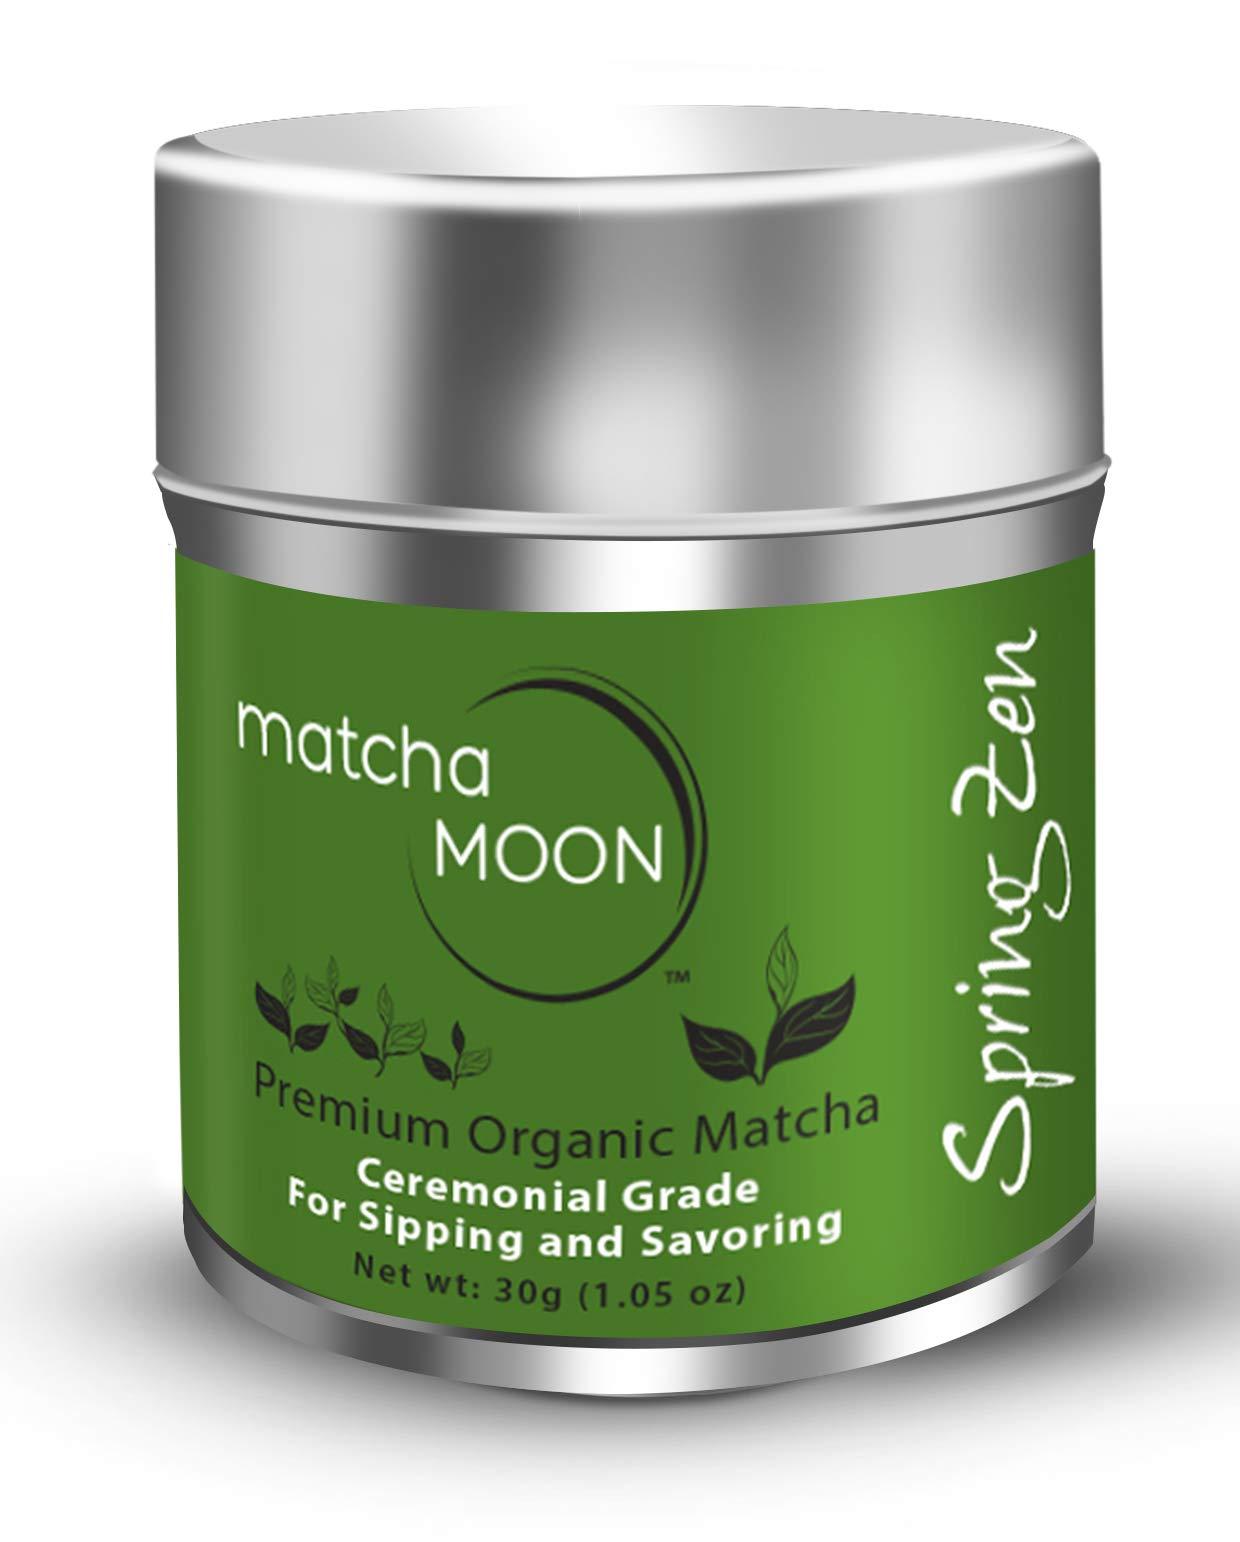 Matcha Moon Uji Matcha Green Tea Powder | Japanese Ceremonial Grade | USDA Organic | Vegan, Natural, Gluten-free, Sugar-free | Best-tasting Everyday Drinking Matcha | Antioxidant Superfood | 30g Tin